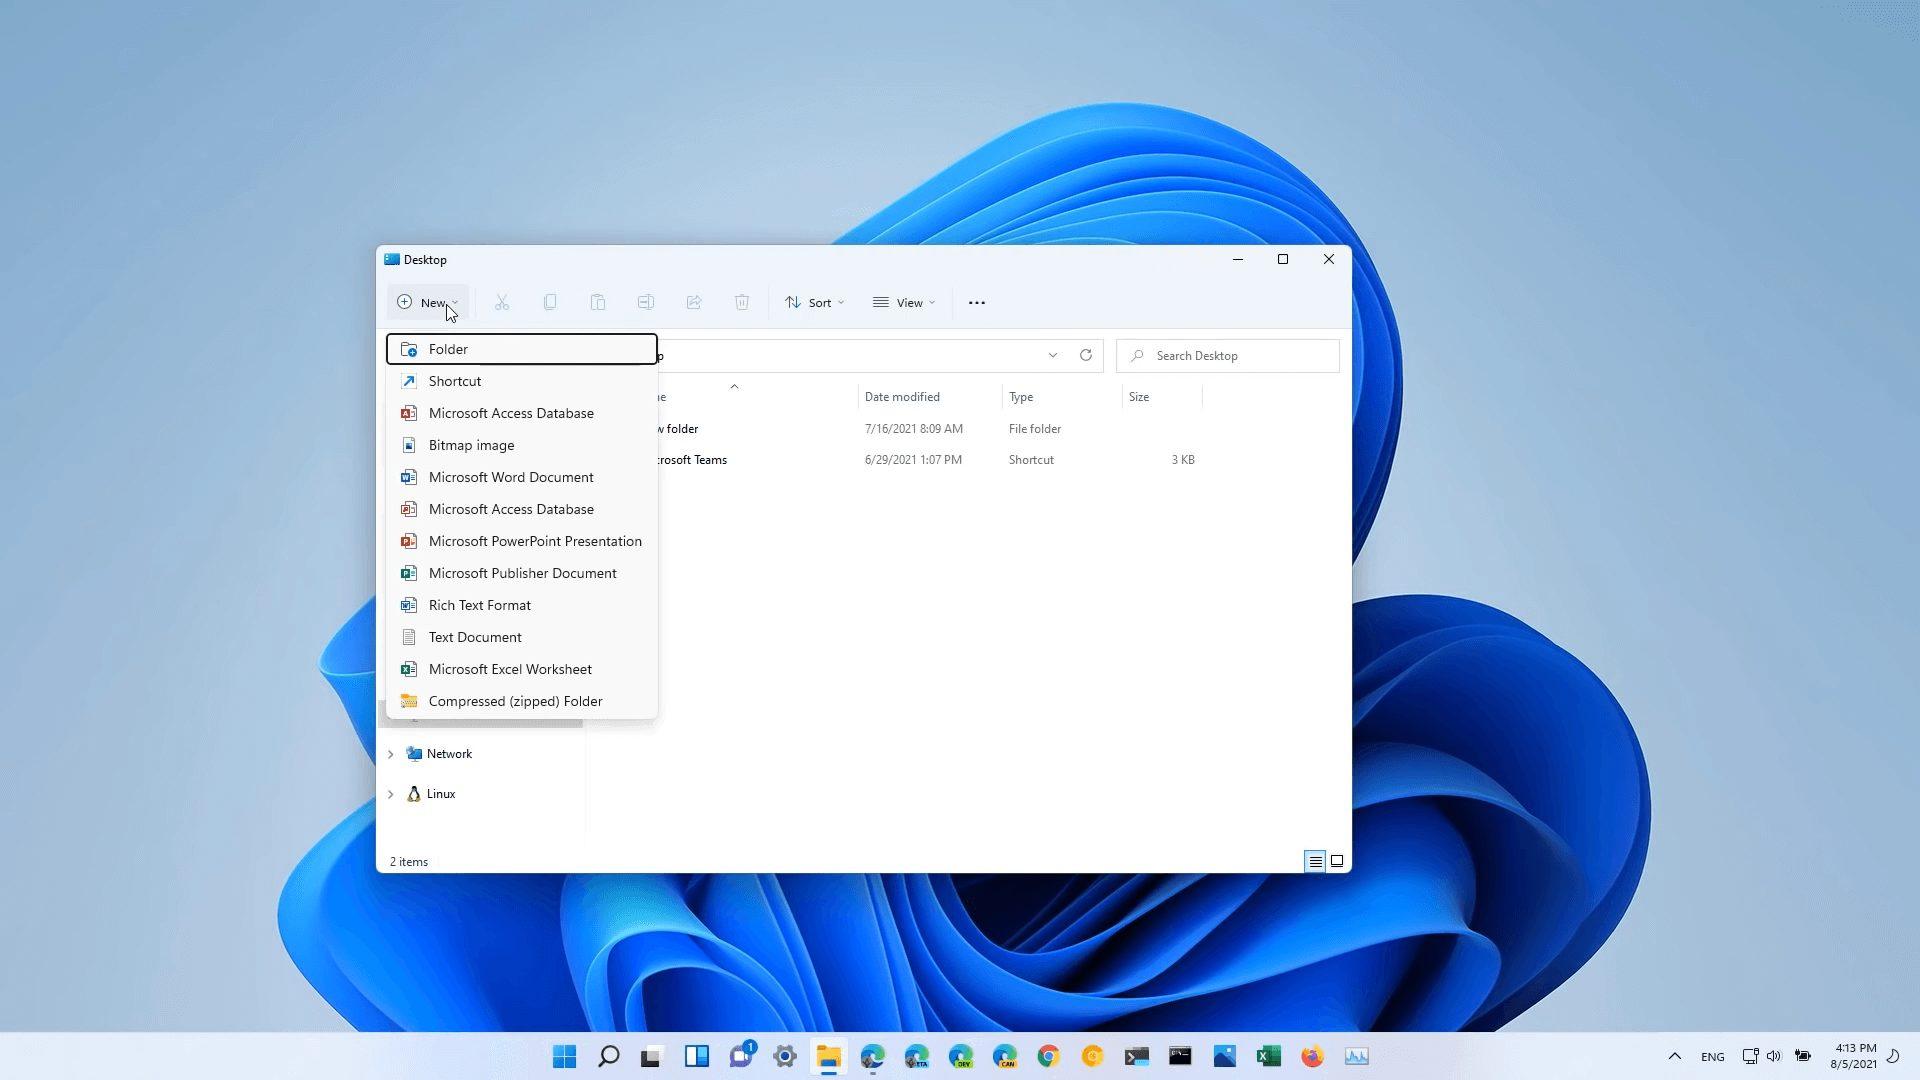 Windows 11 Build 22000.120 File Explorer New Item Context Menu